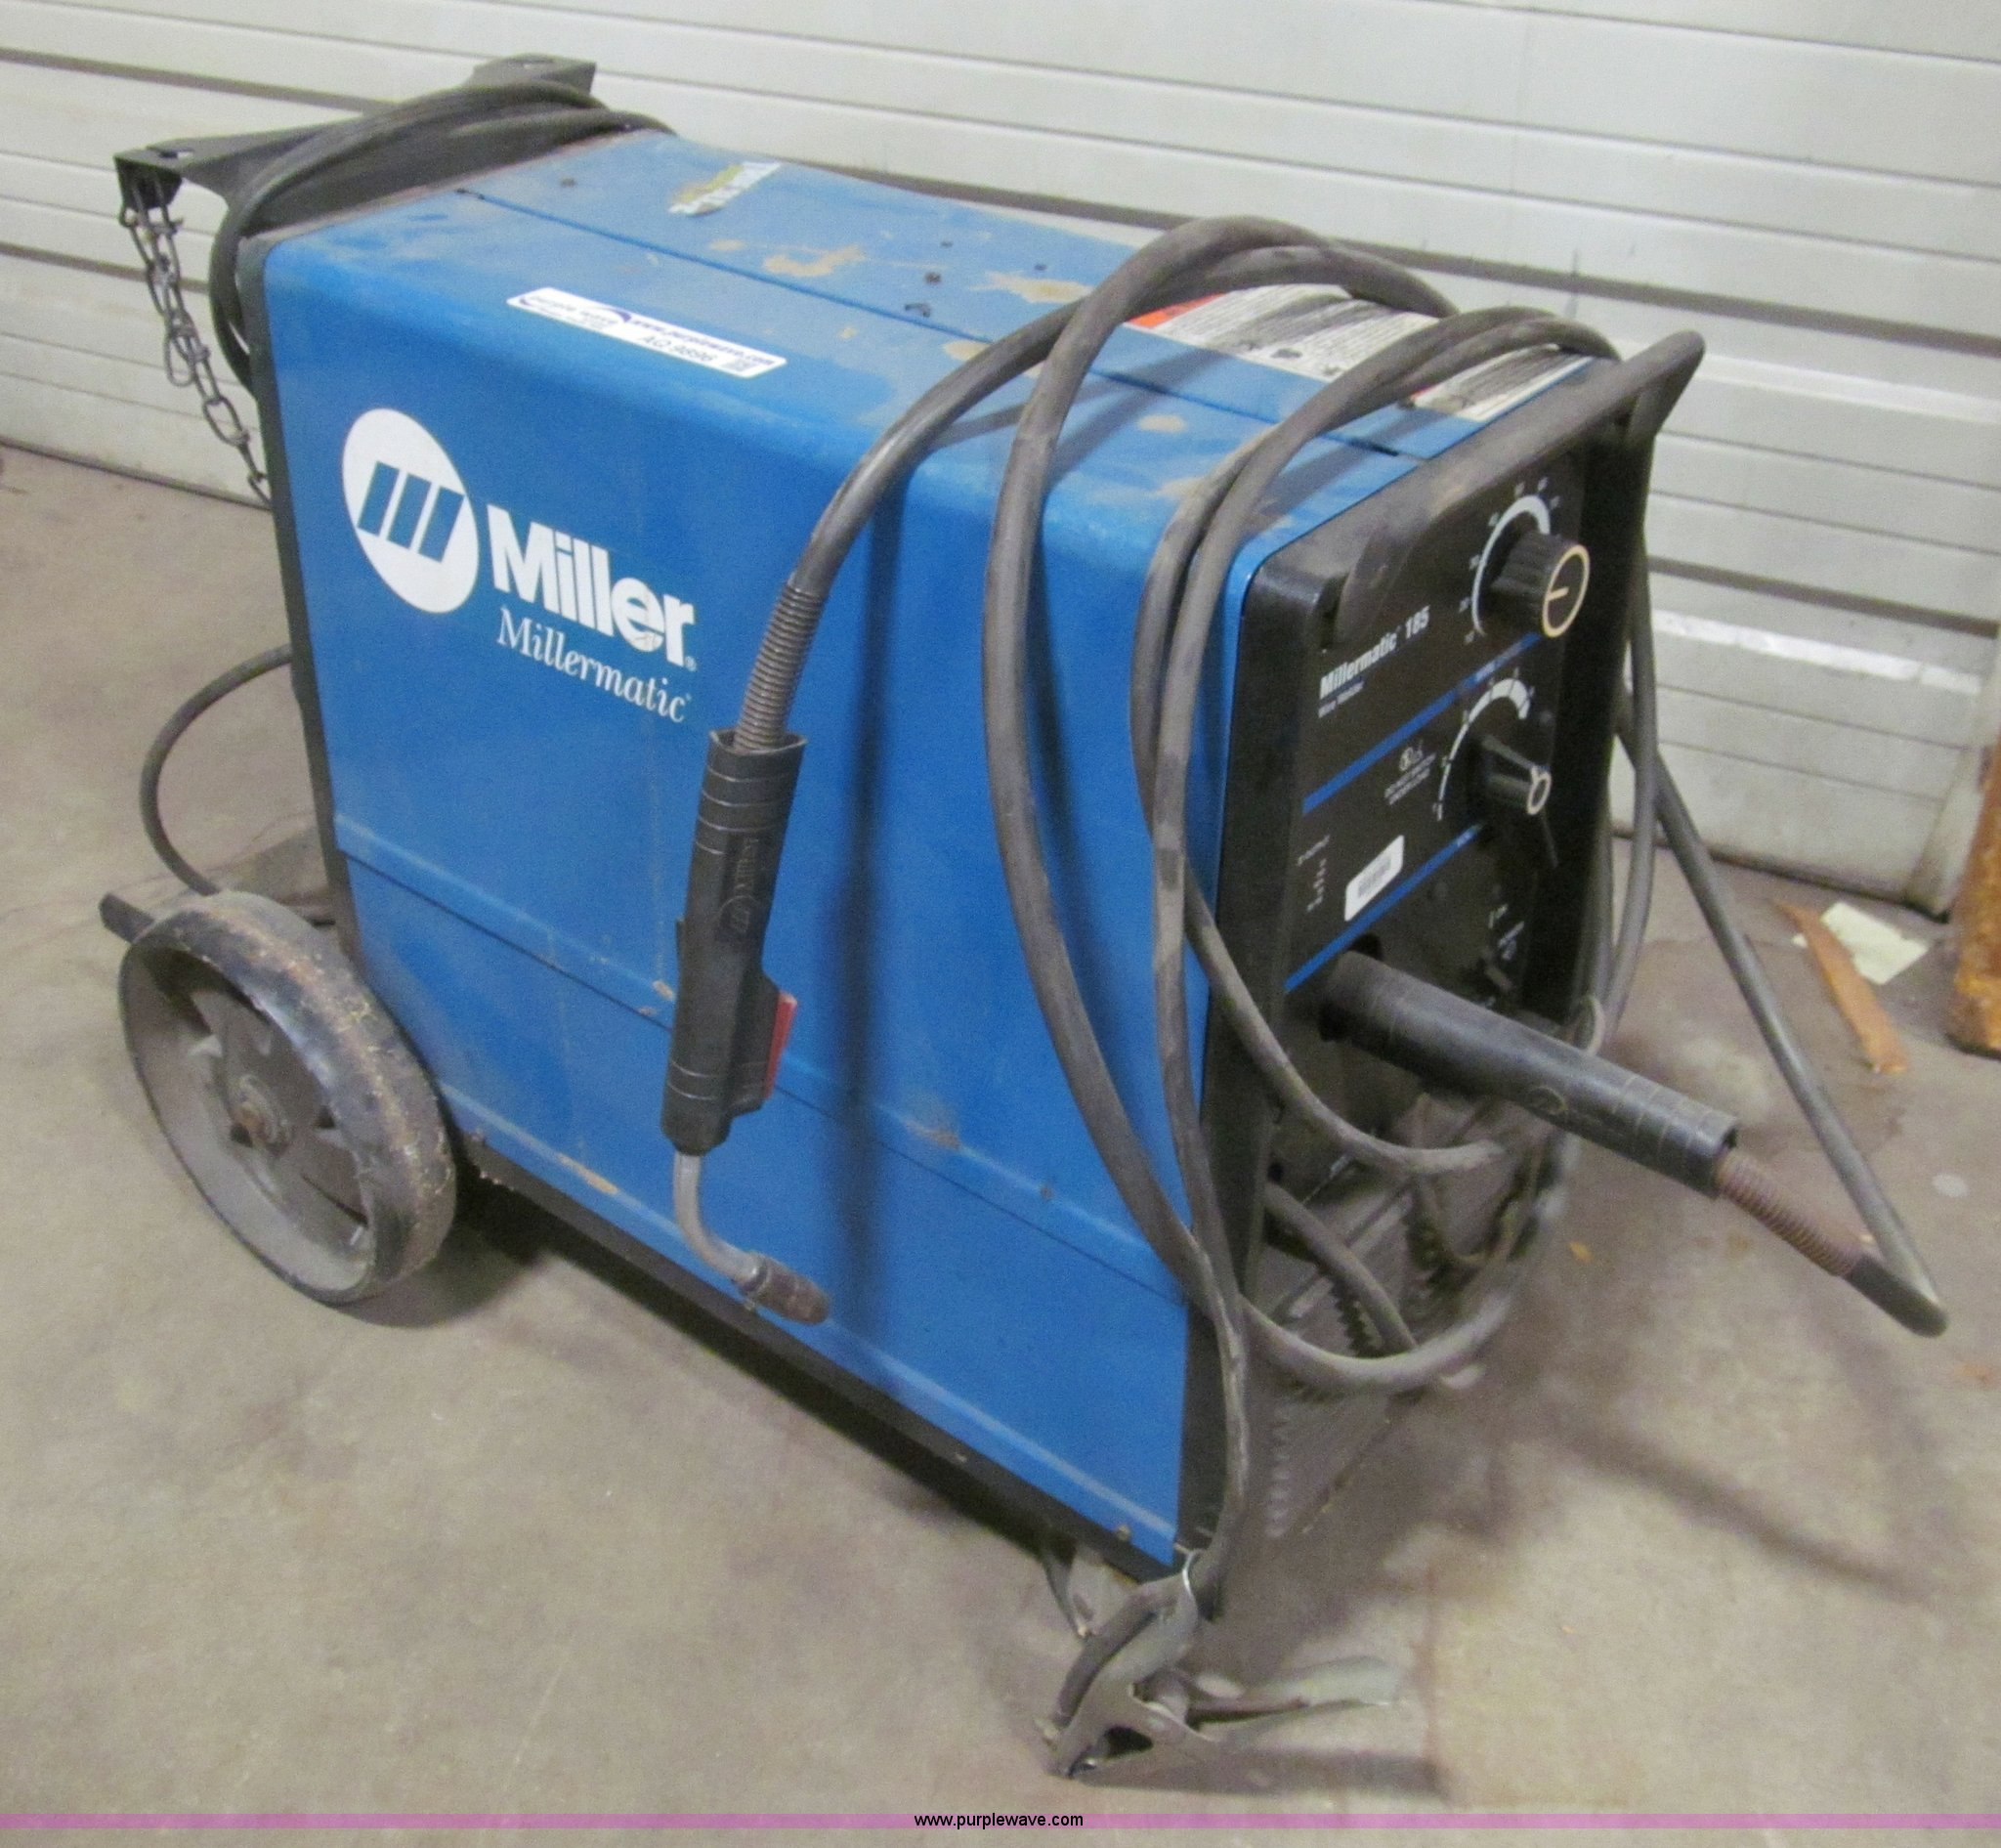 Miller Mig Welder For Sale >> Miller Millermatic 185 Wire Welder Item Aq9896 Sold May